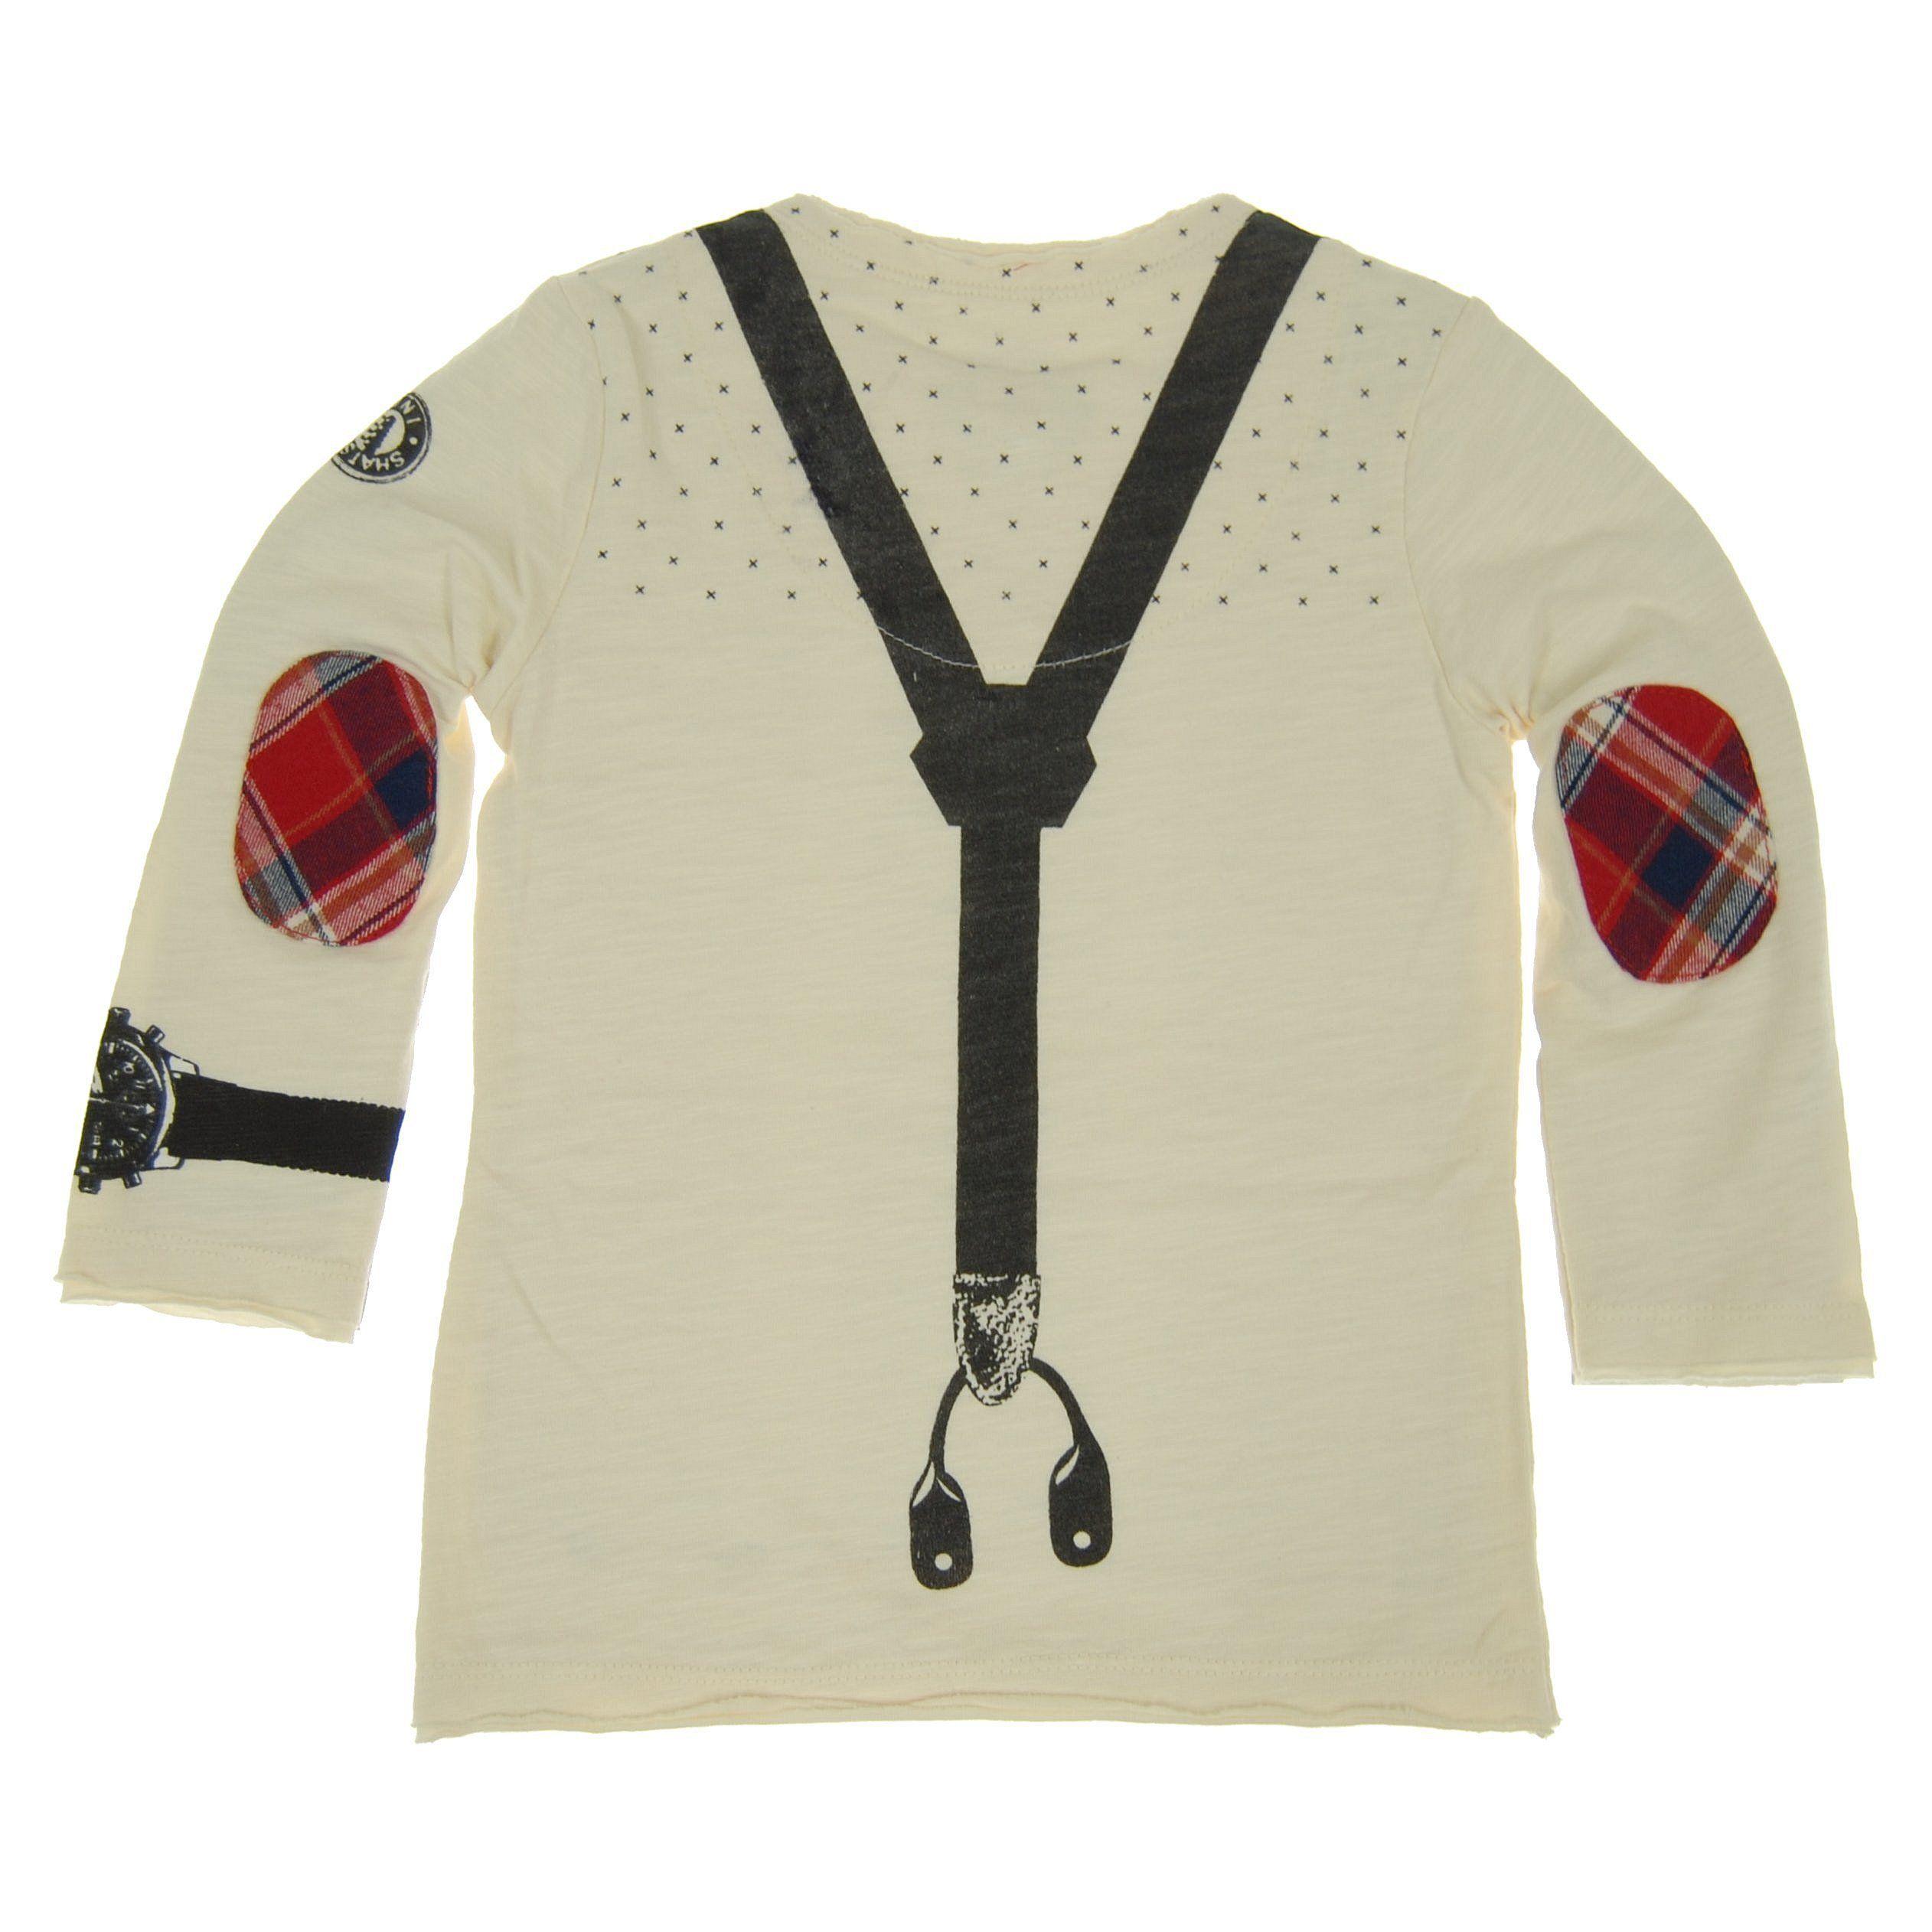 Mini Shatsu Real Suspender Bow Tie Baby Henley Shirt